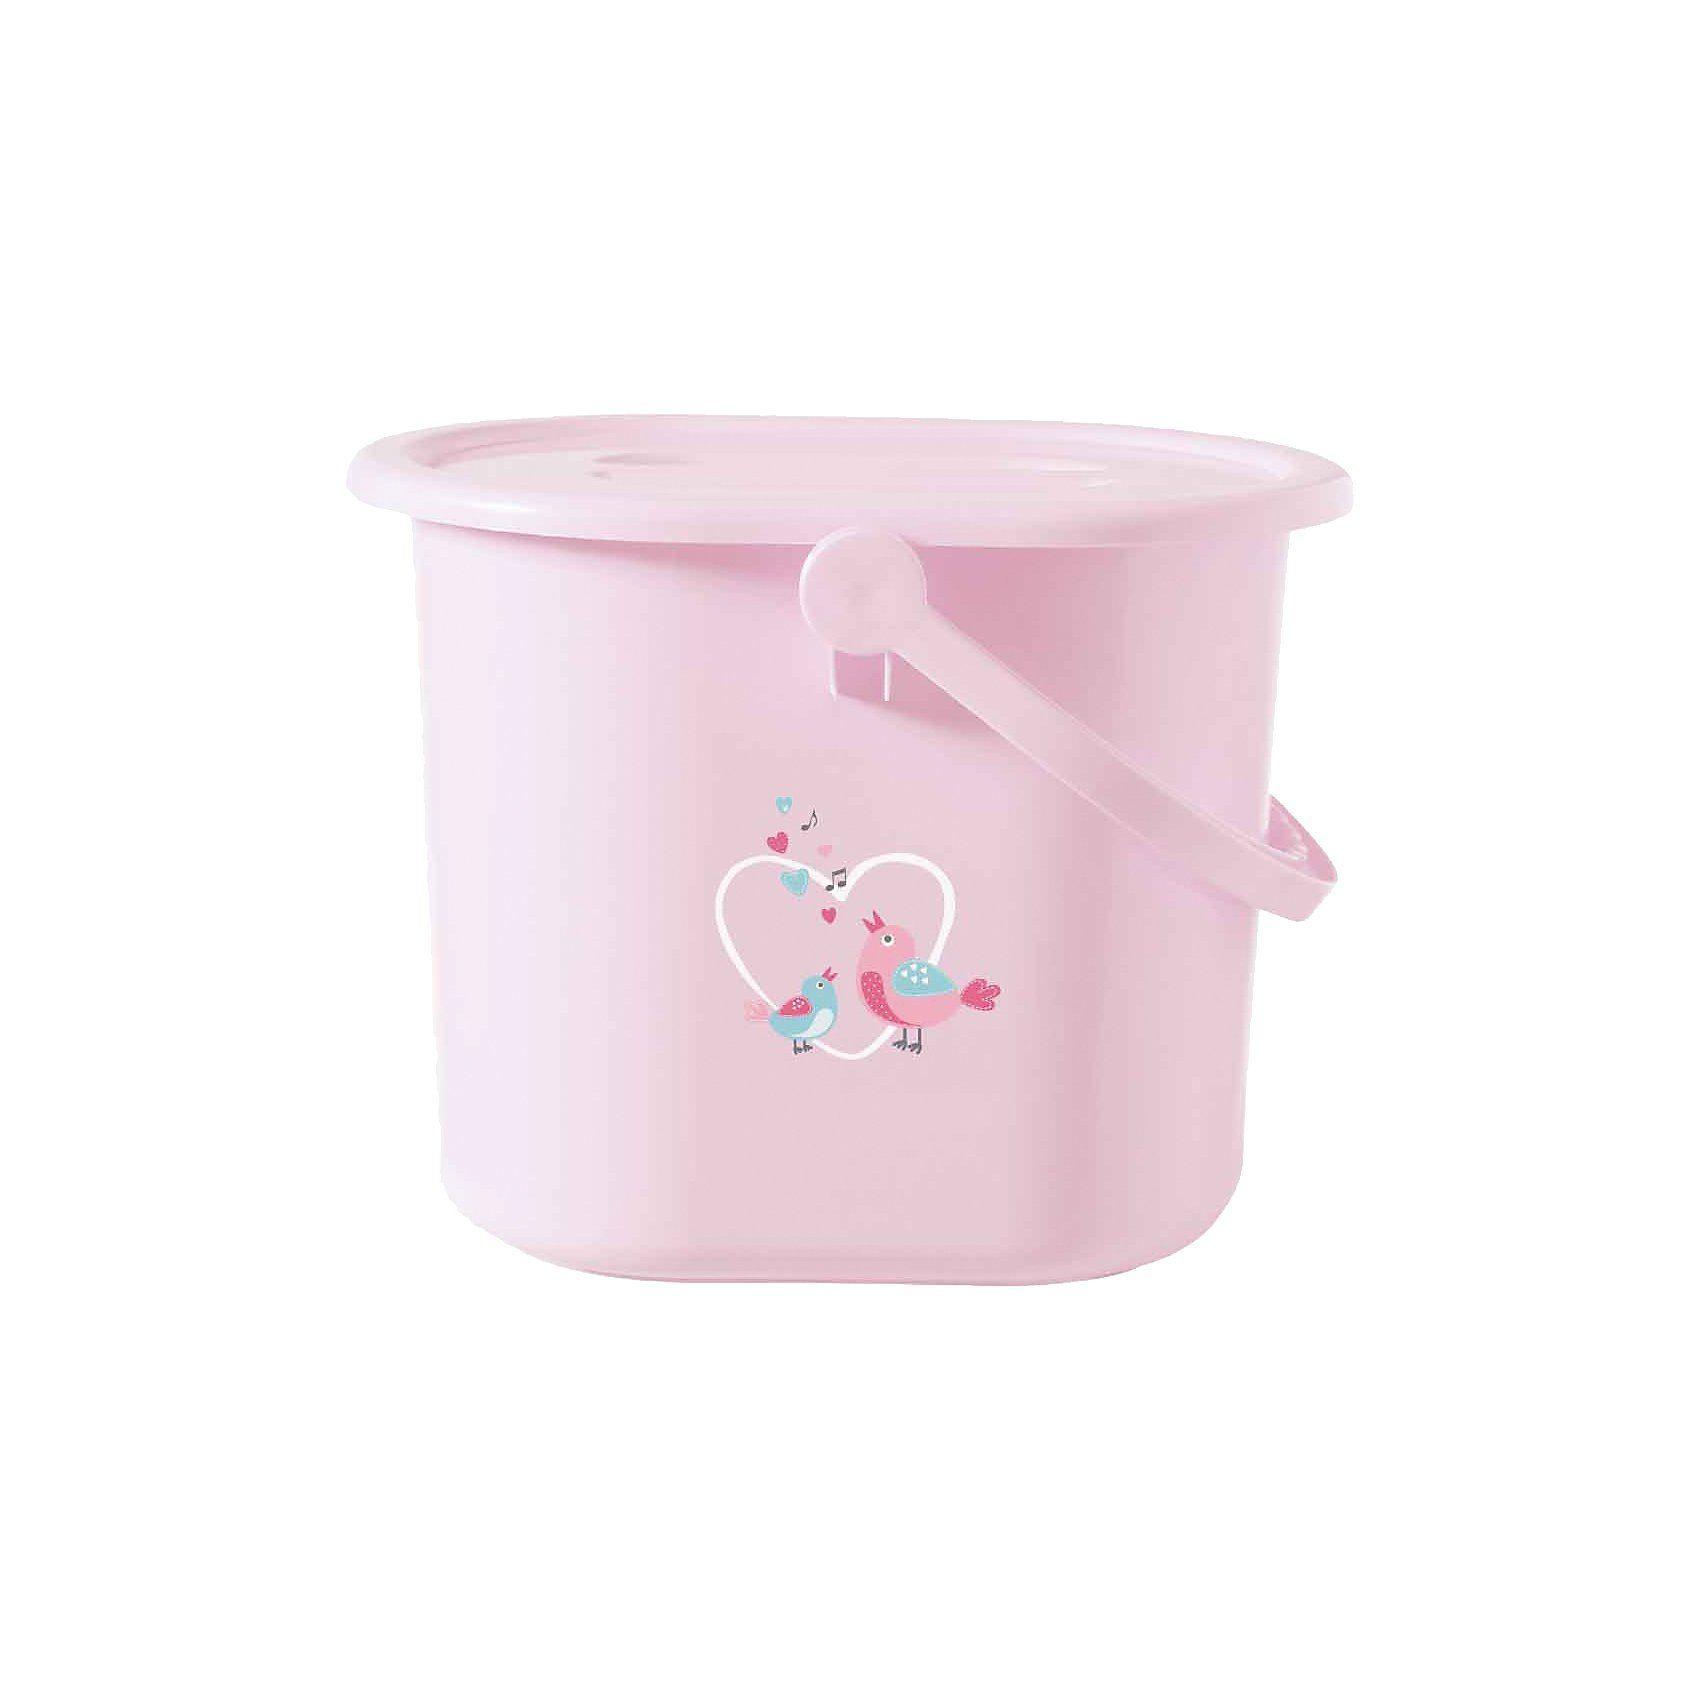 bébé-jou Windeleimer Sweet Birds, rosa